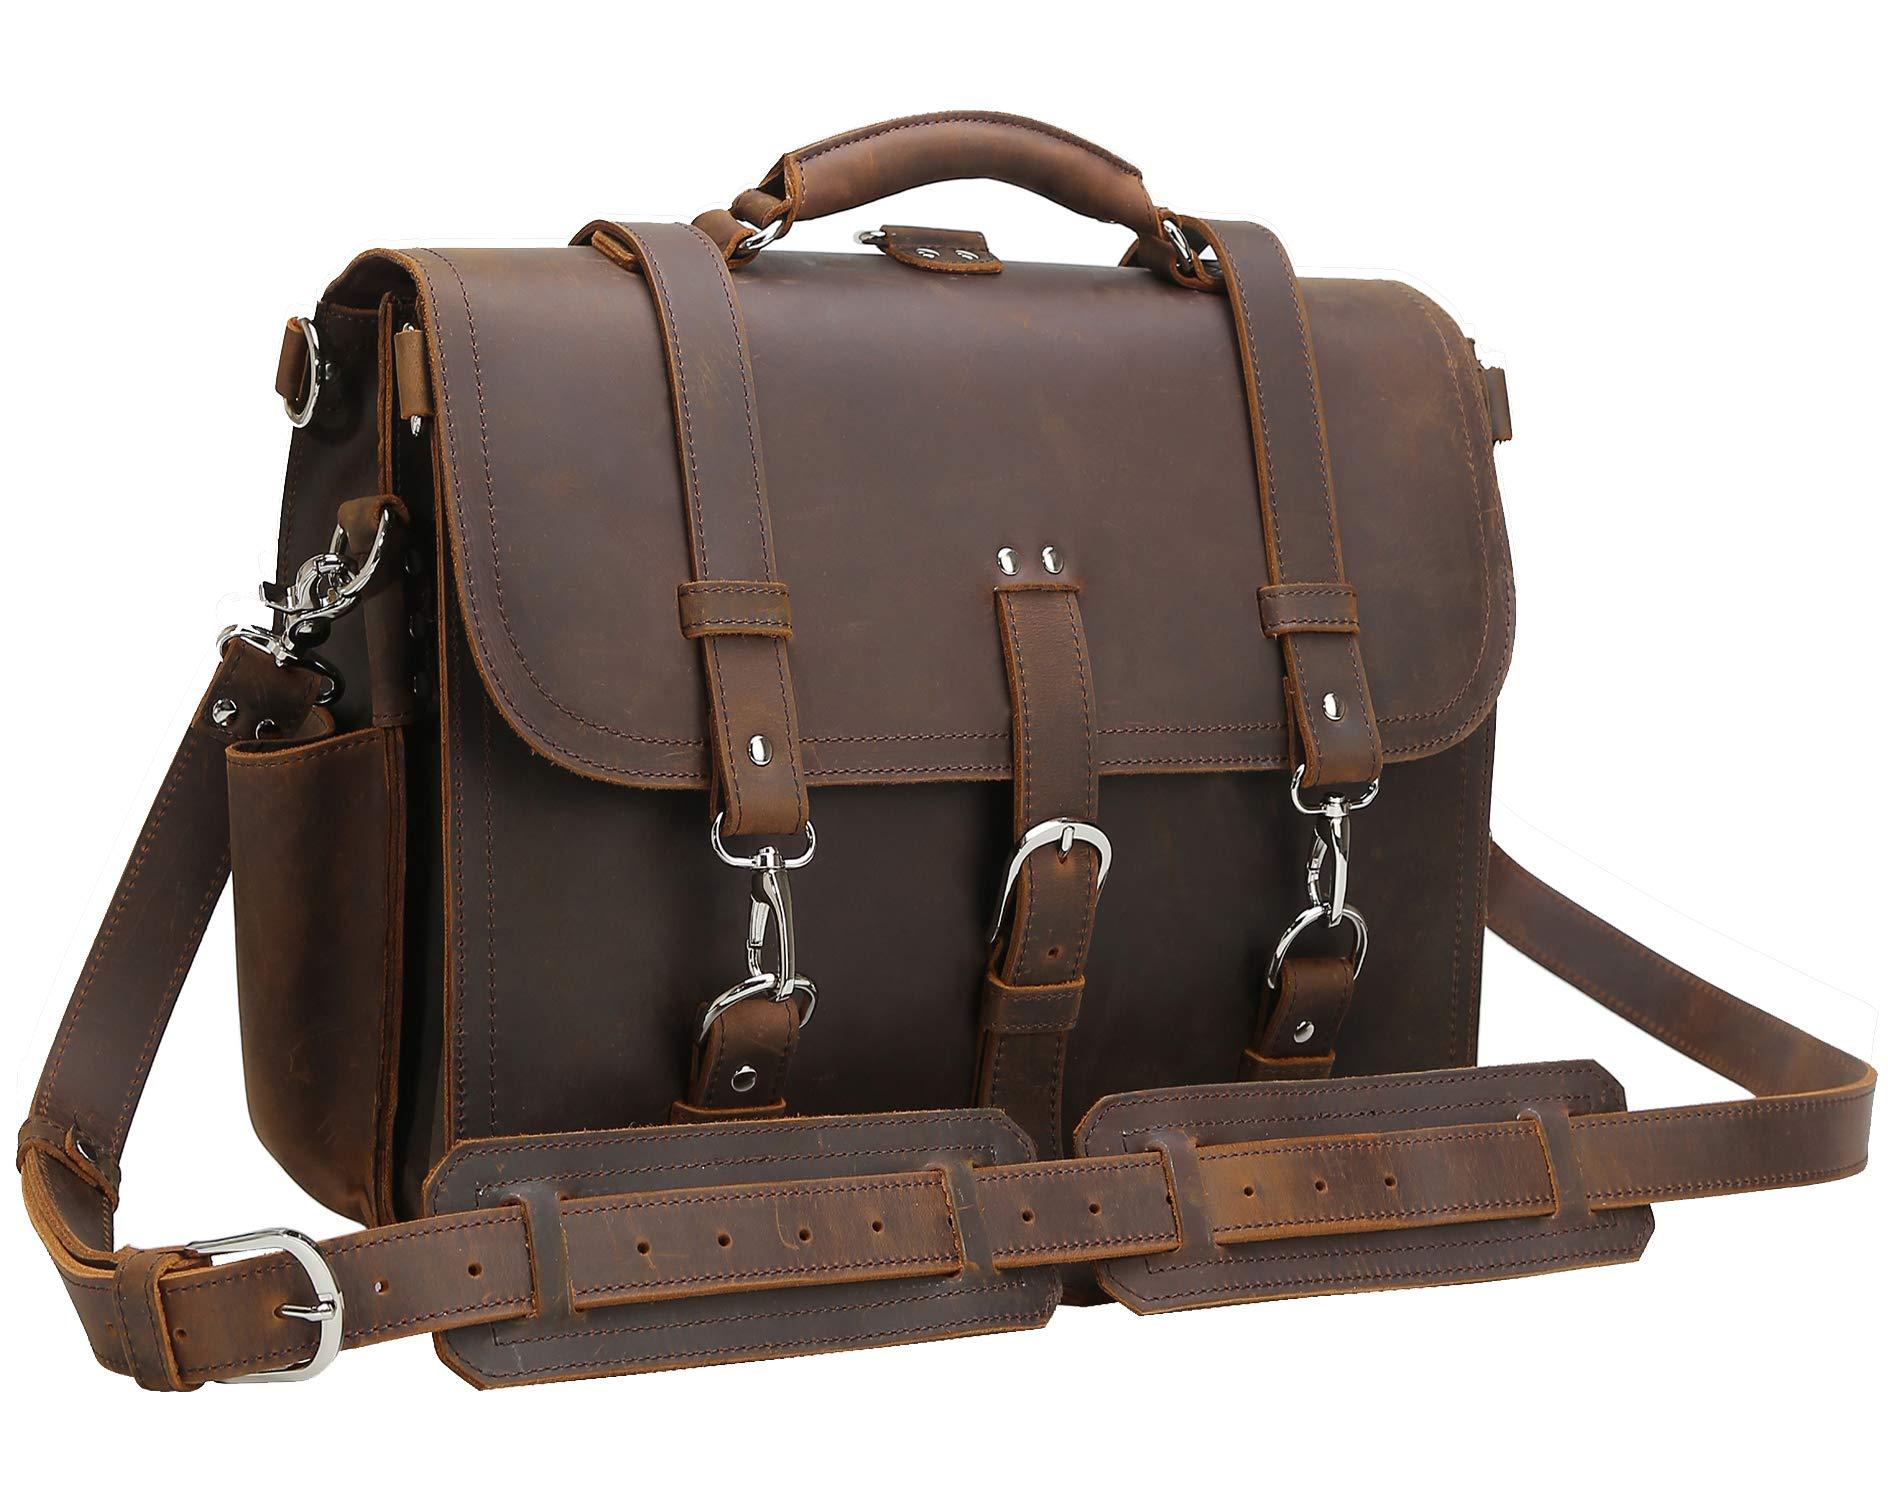 Polare Men's Full Grain Leather 16'' Laptop Briefcase Shoulder Messenger Bag by Polare (Image #1)